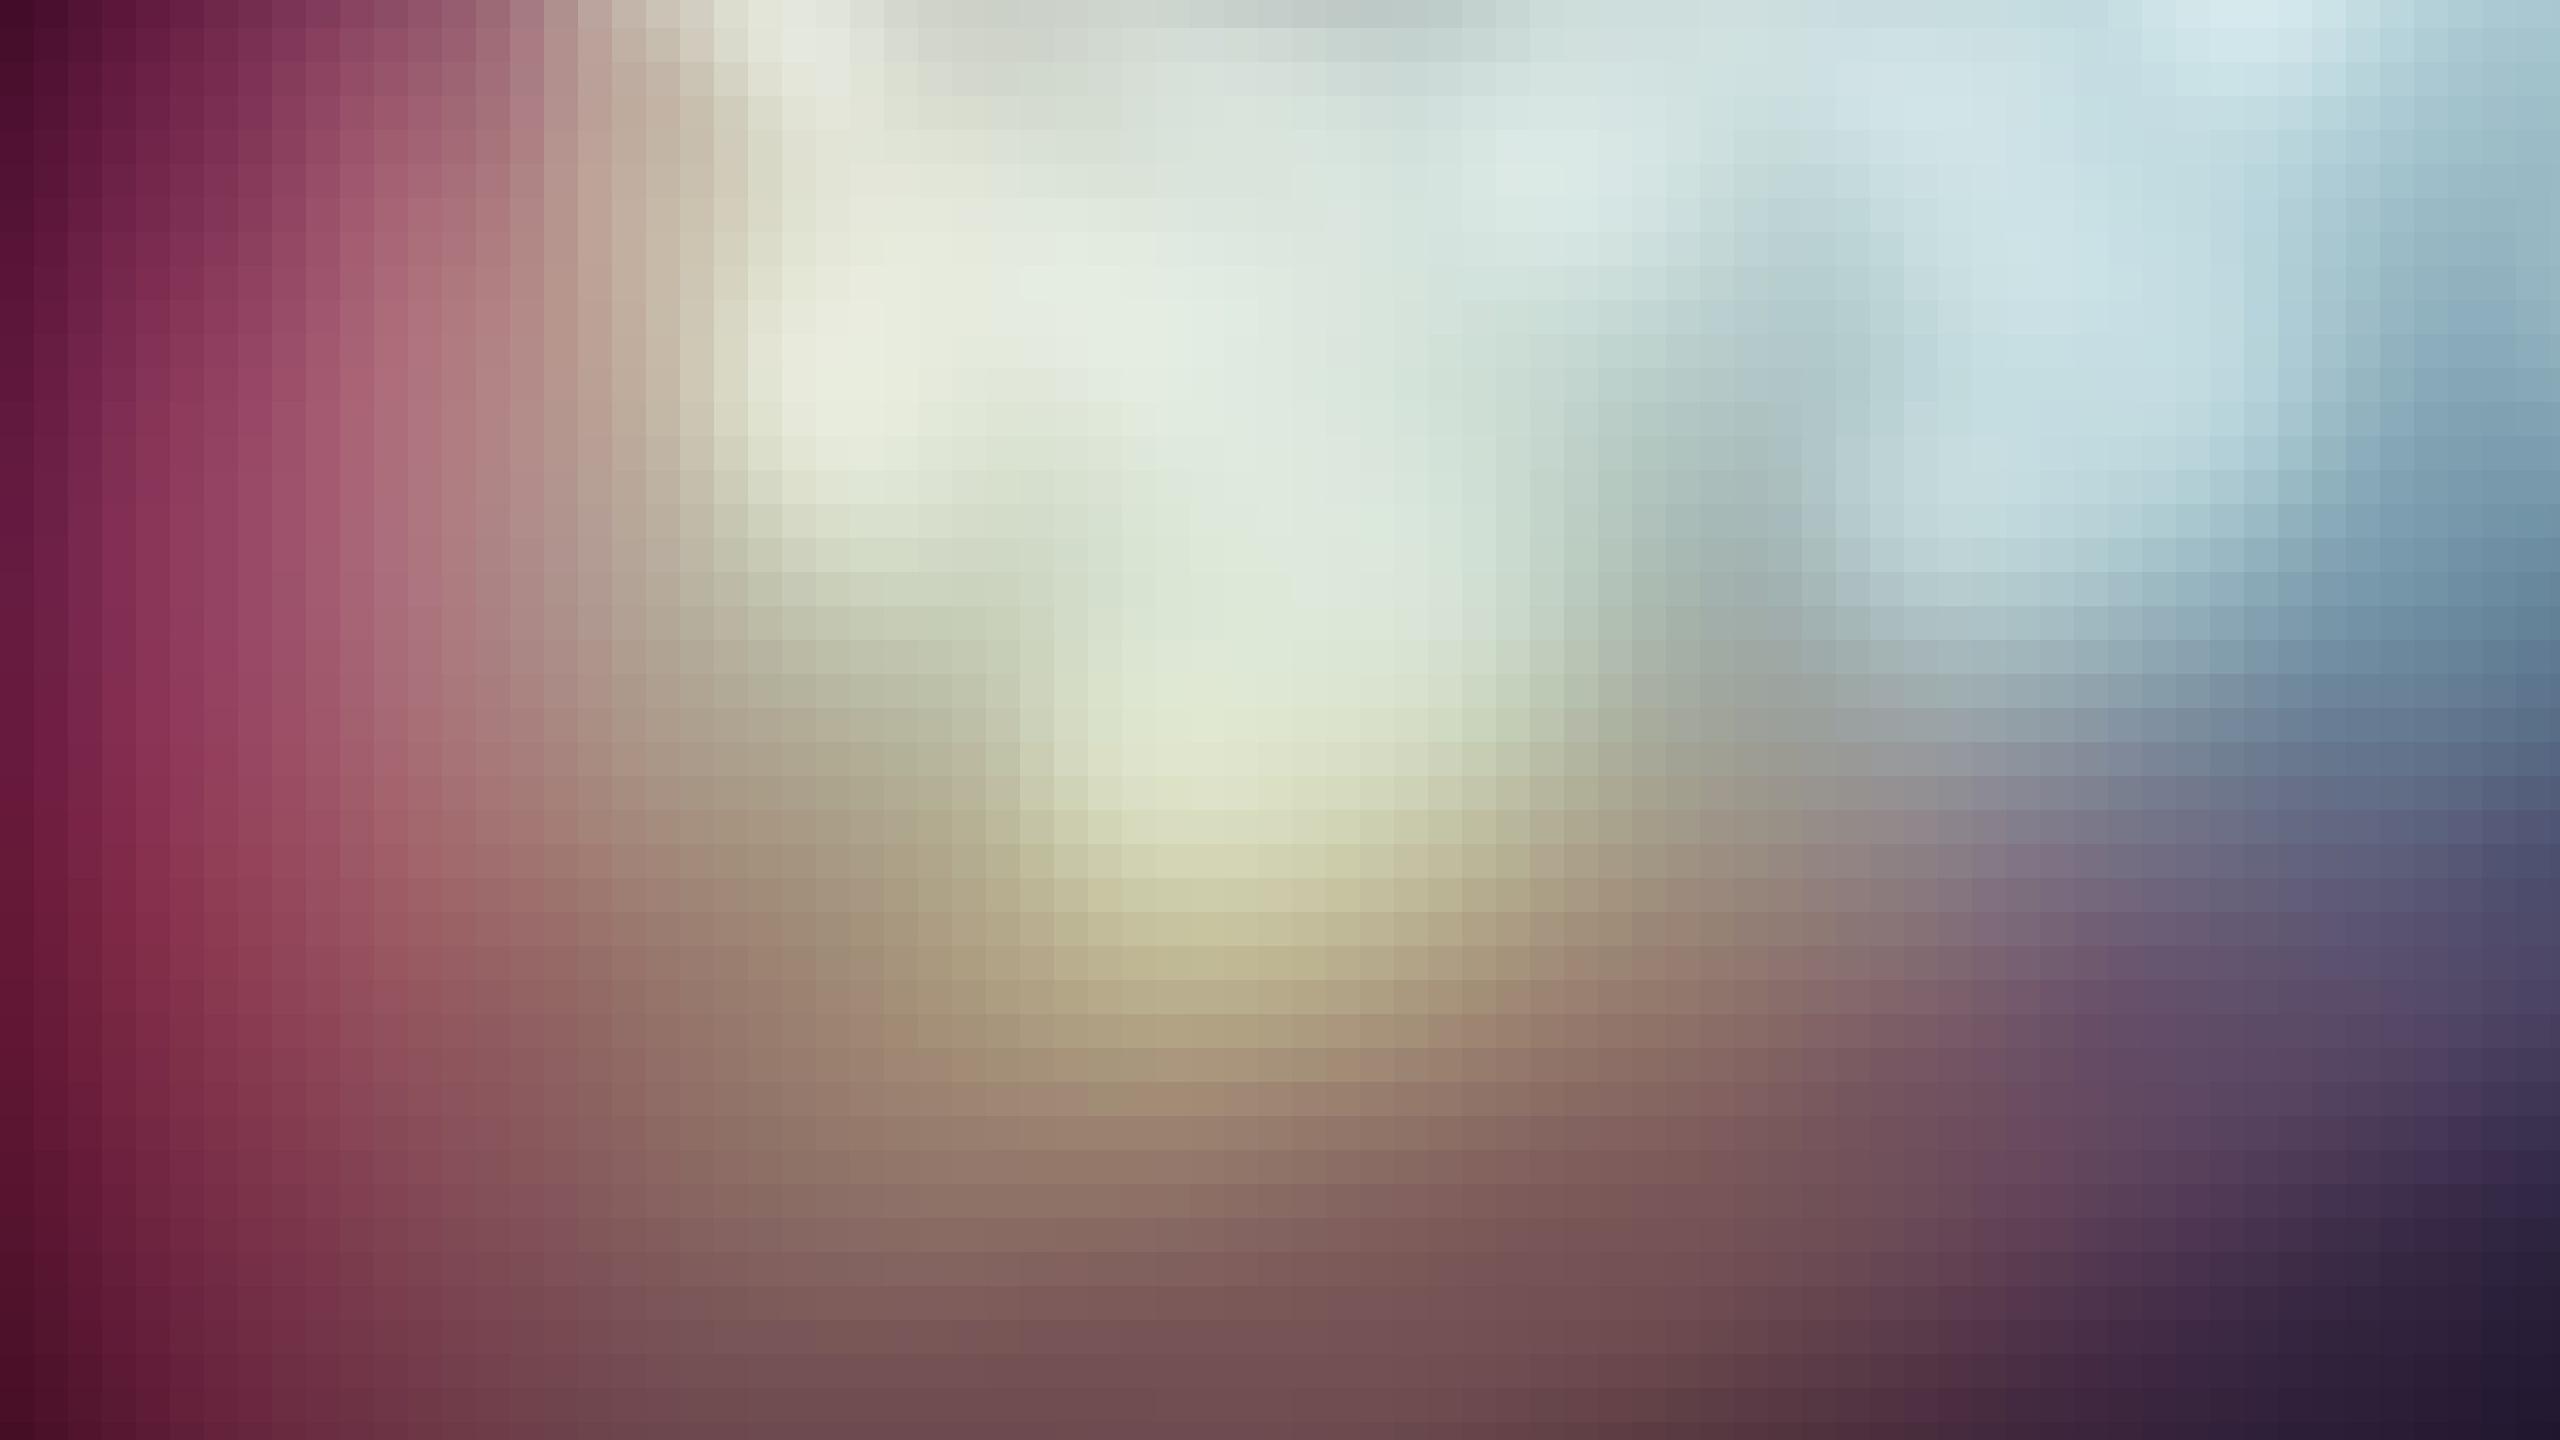 cool blurry wallpaper 35105